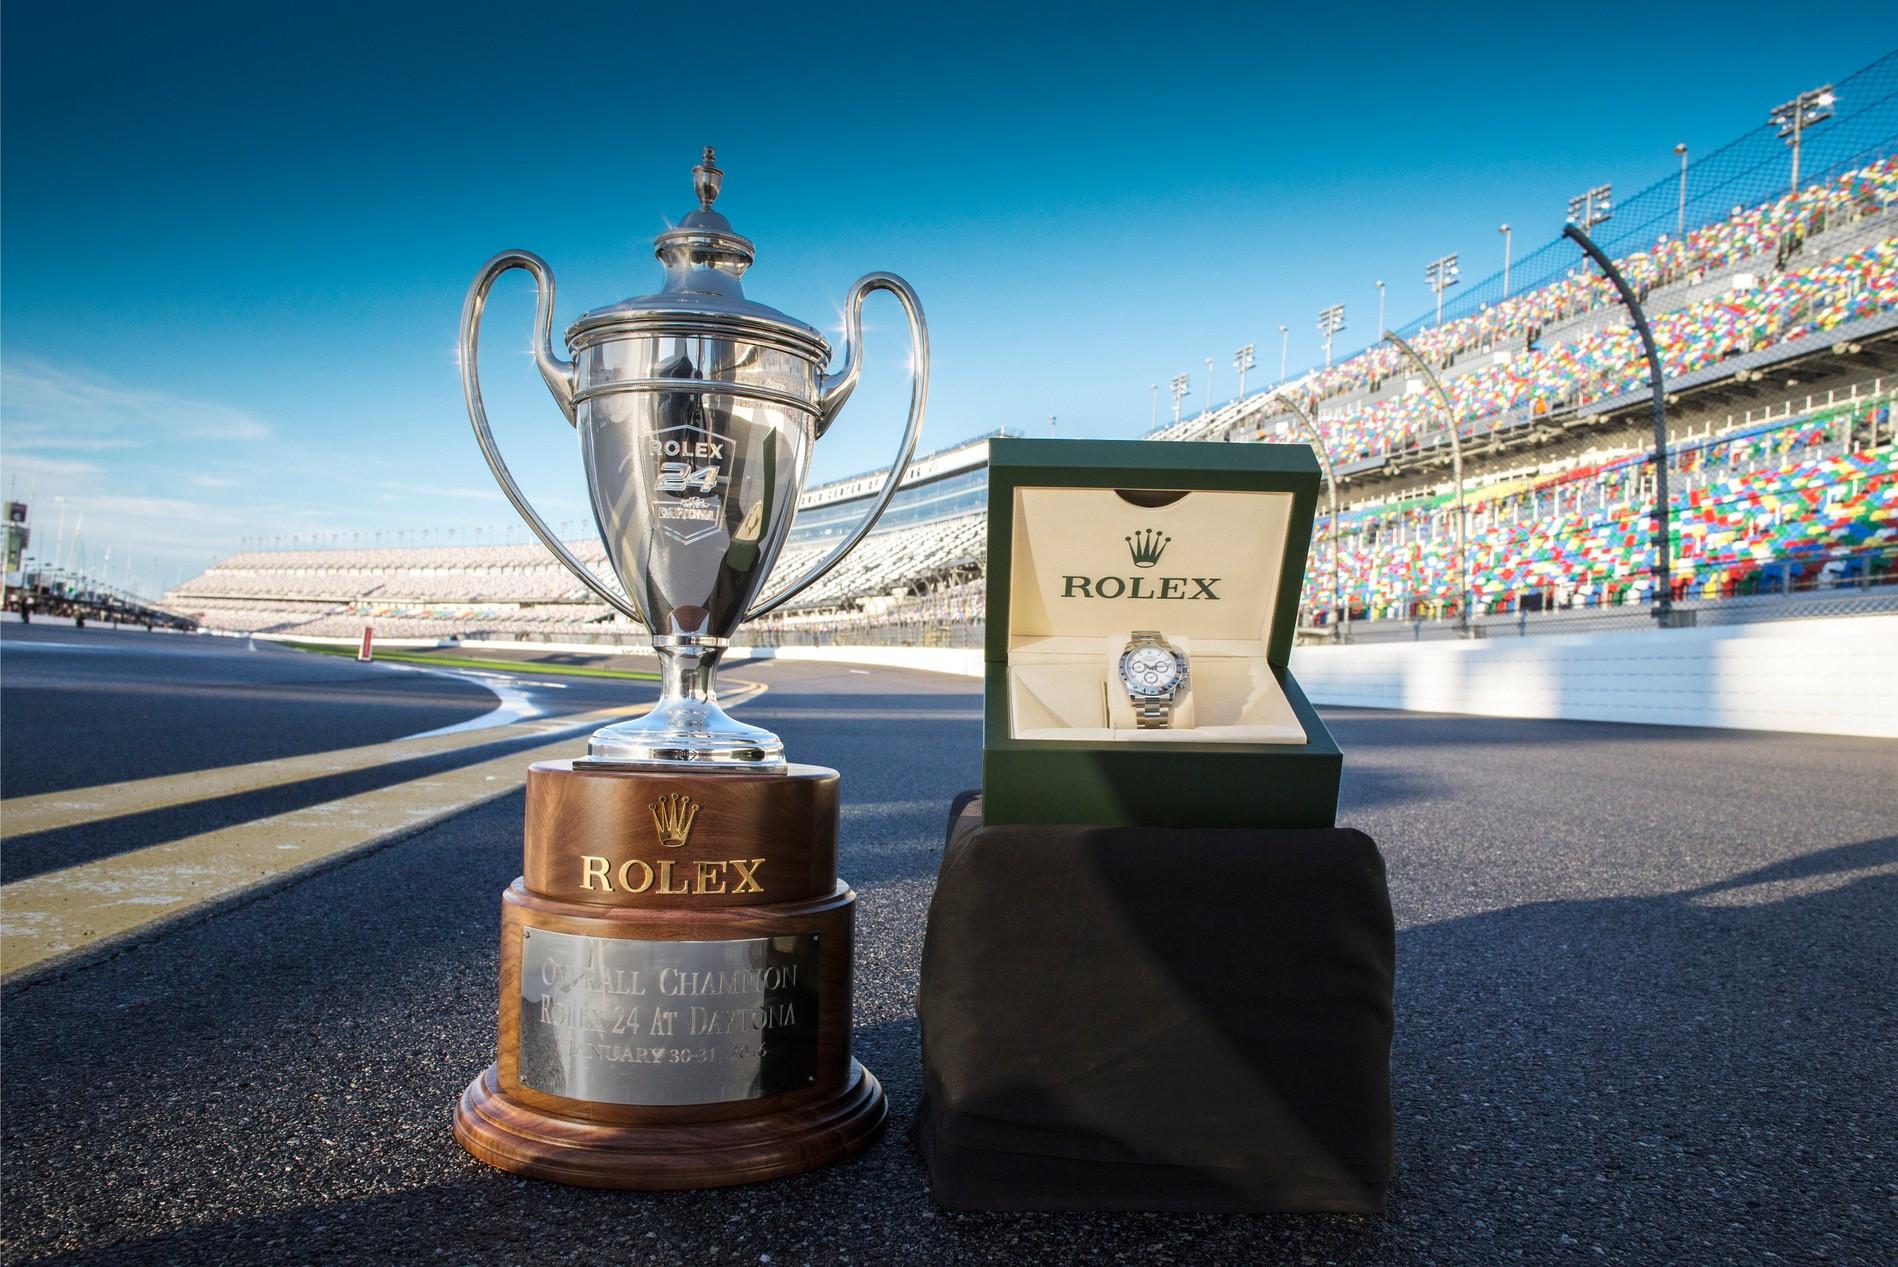 2016 Rolex 24 Trophy and Winners Watch